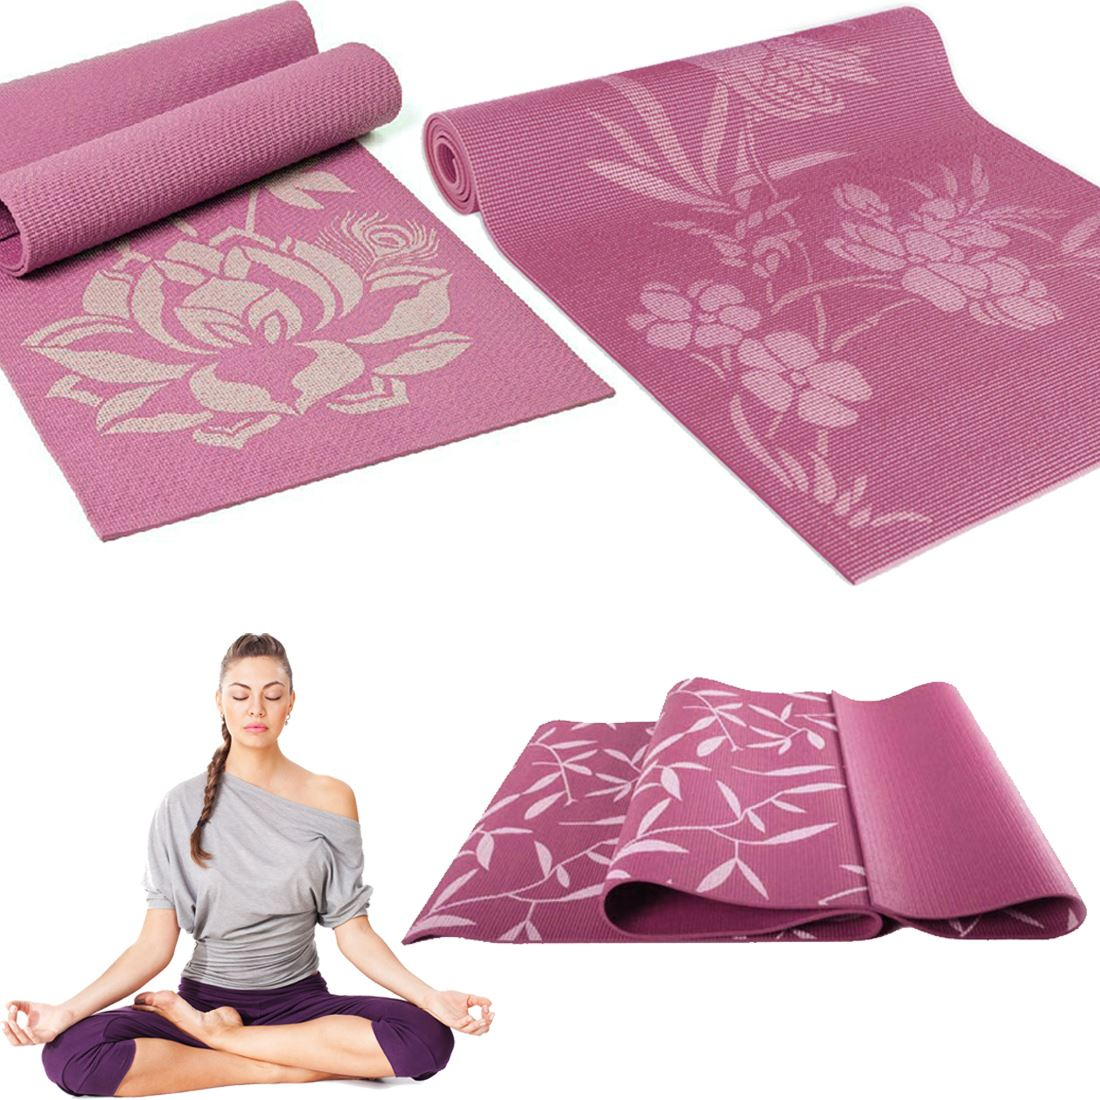 Random Printed Yoga Workout Exercise Fitness Physio